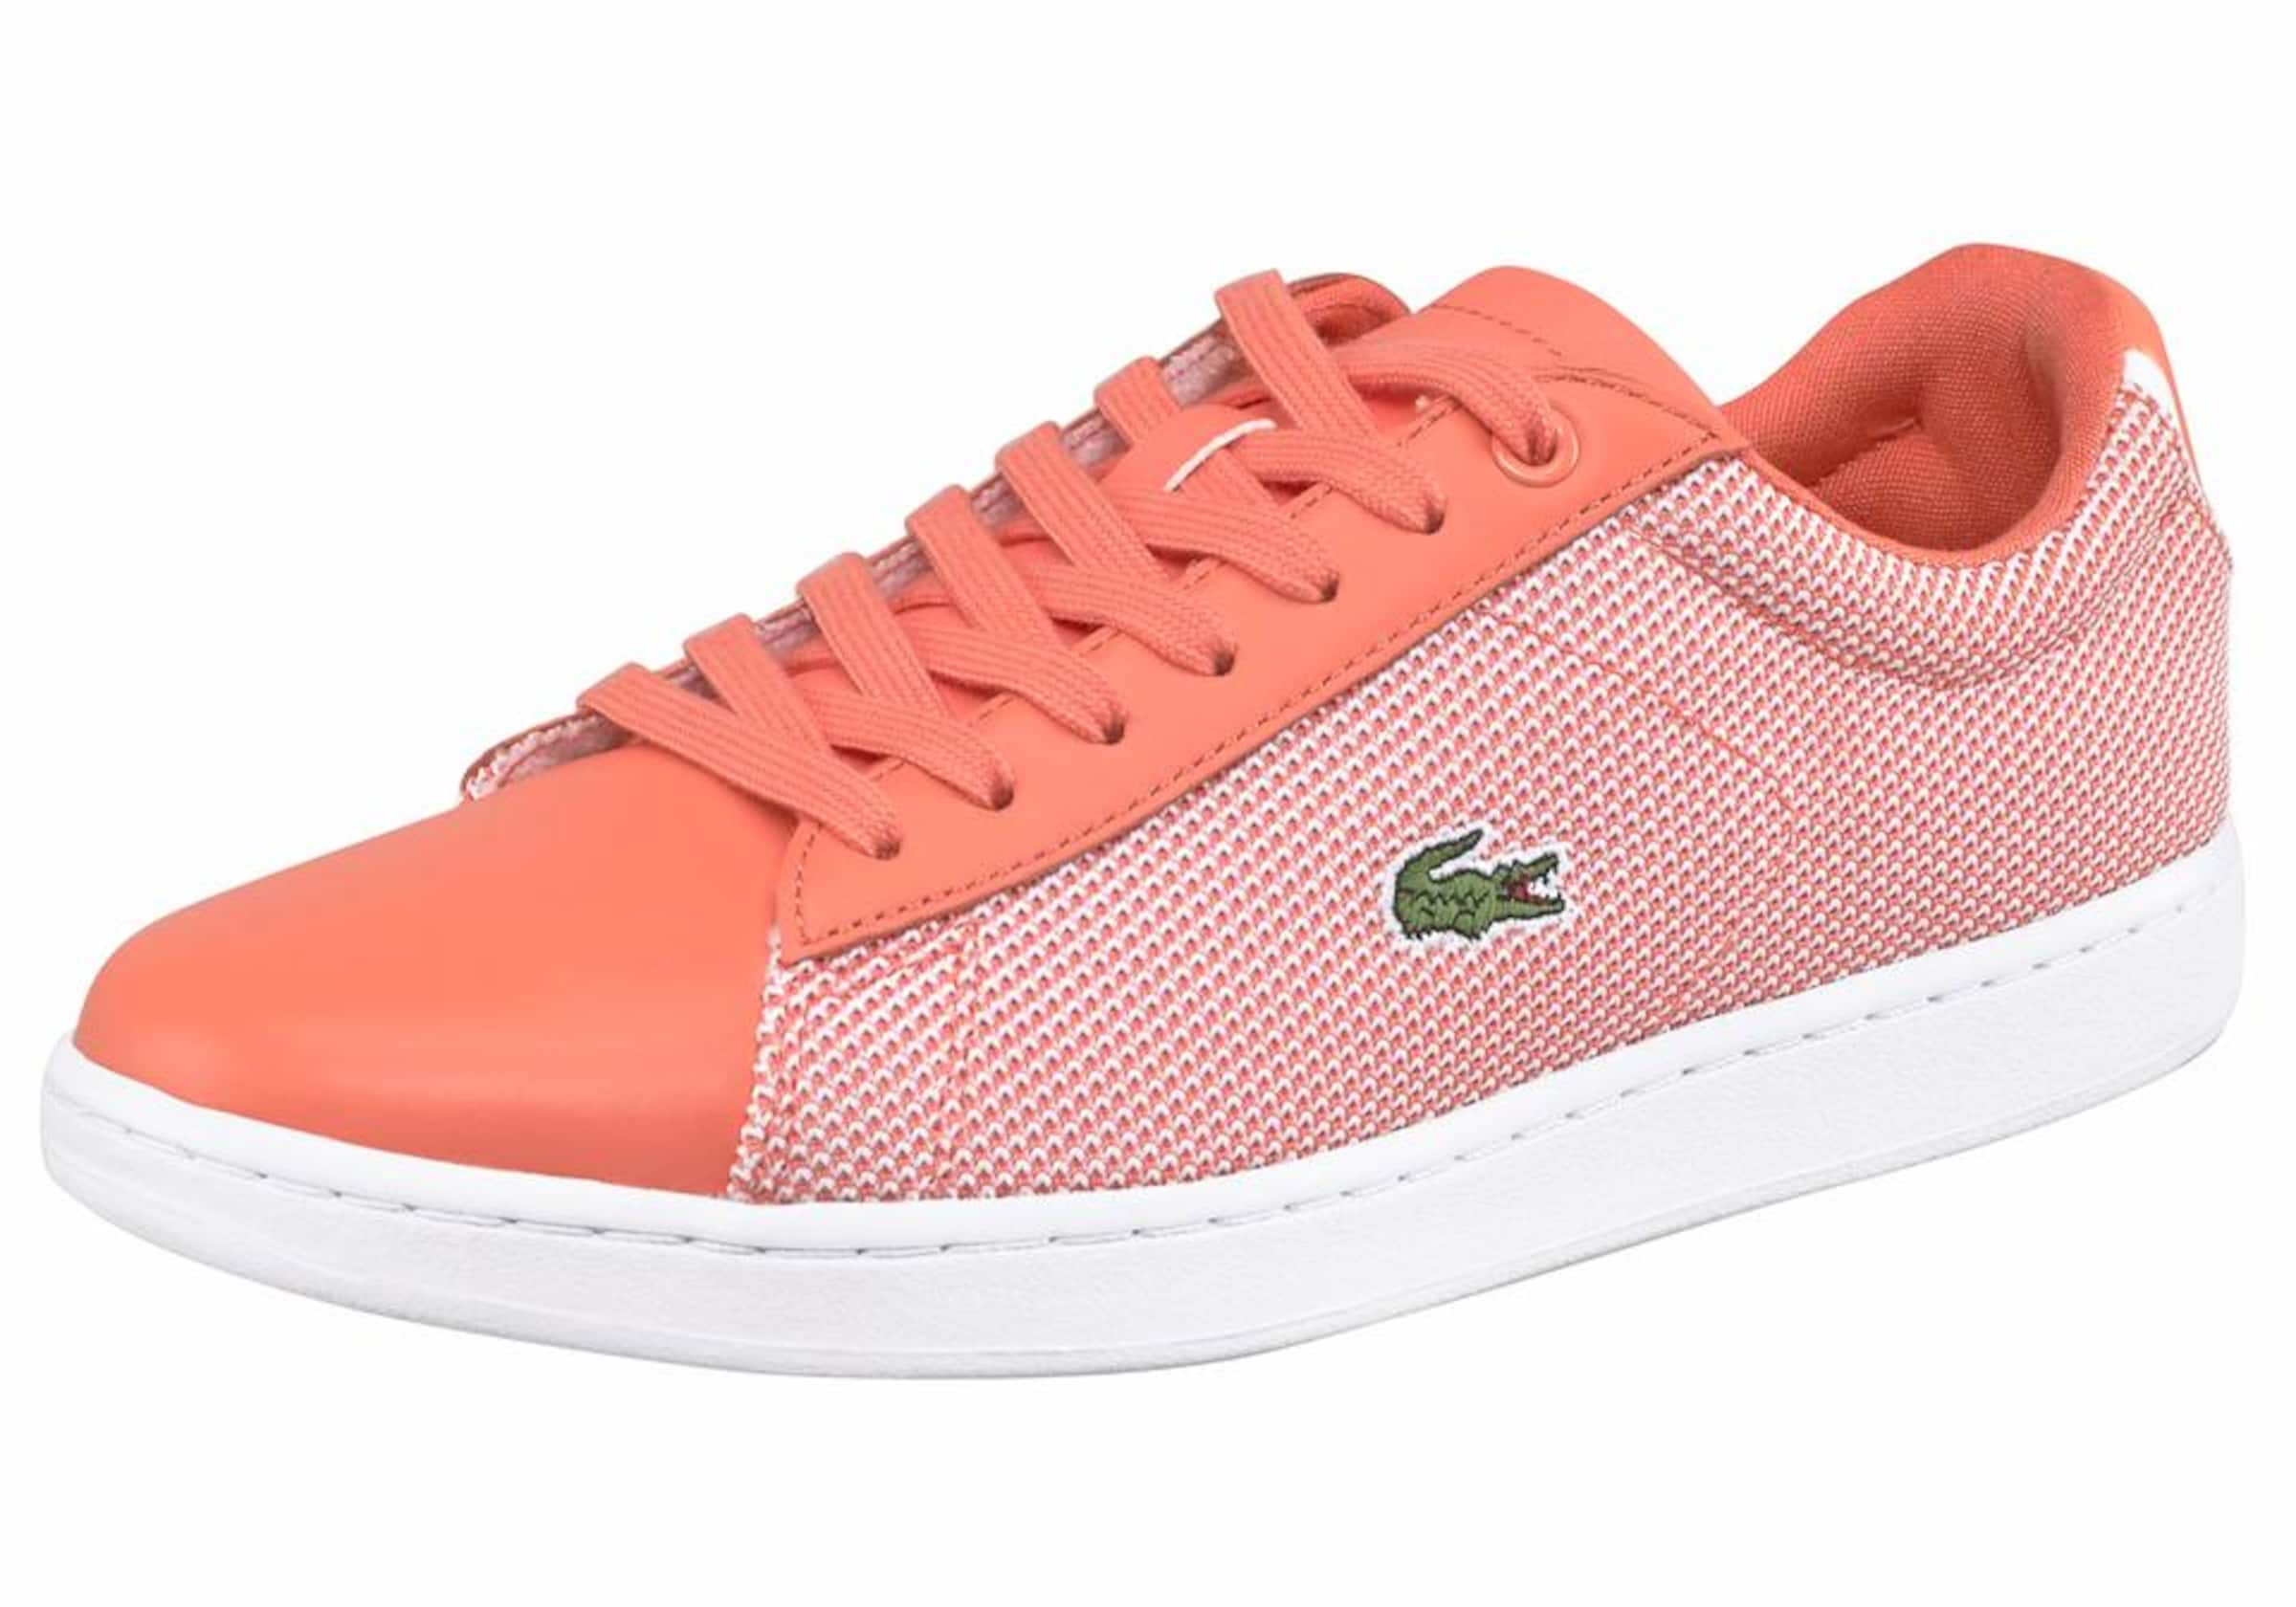 LACOSTE Sneaker 'Carnaby Evo' Frei Verschiffen uUQCJD79tM